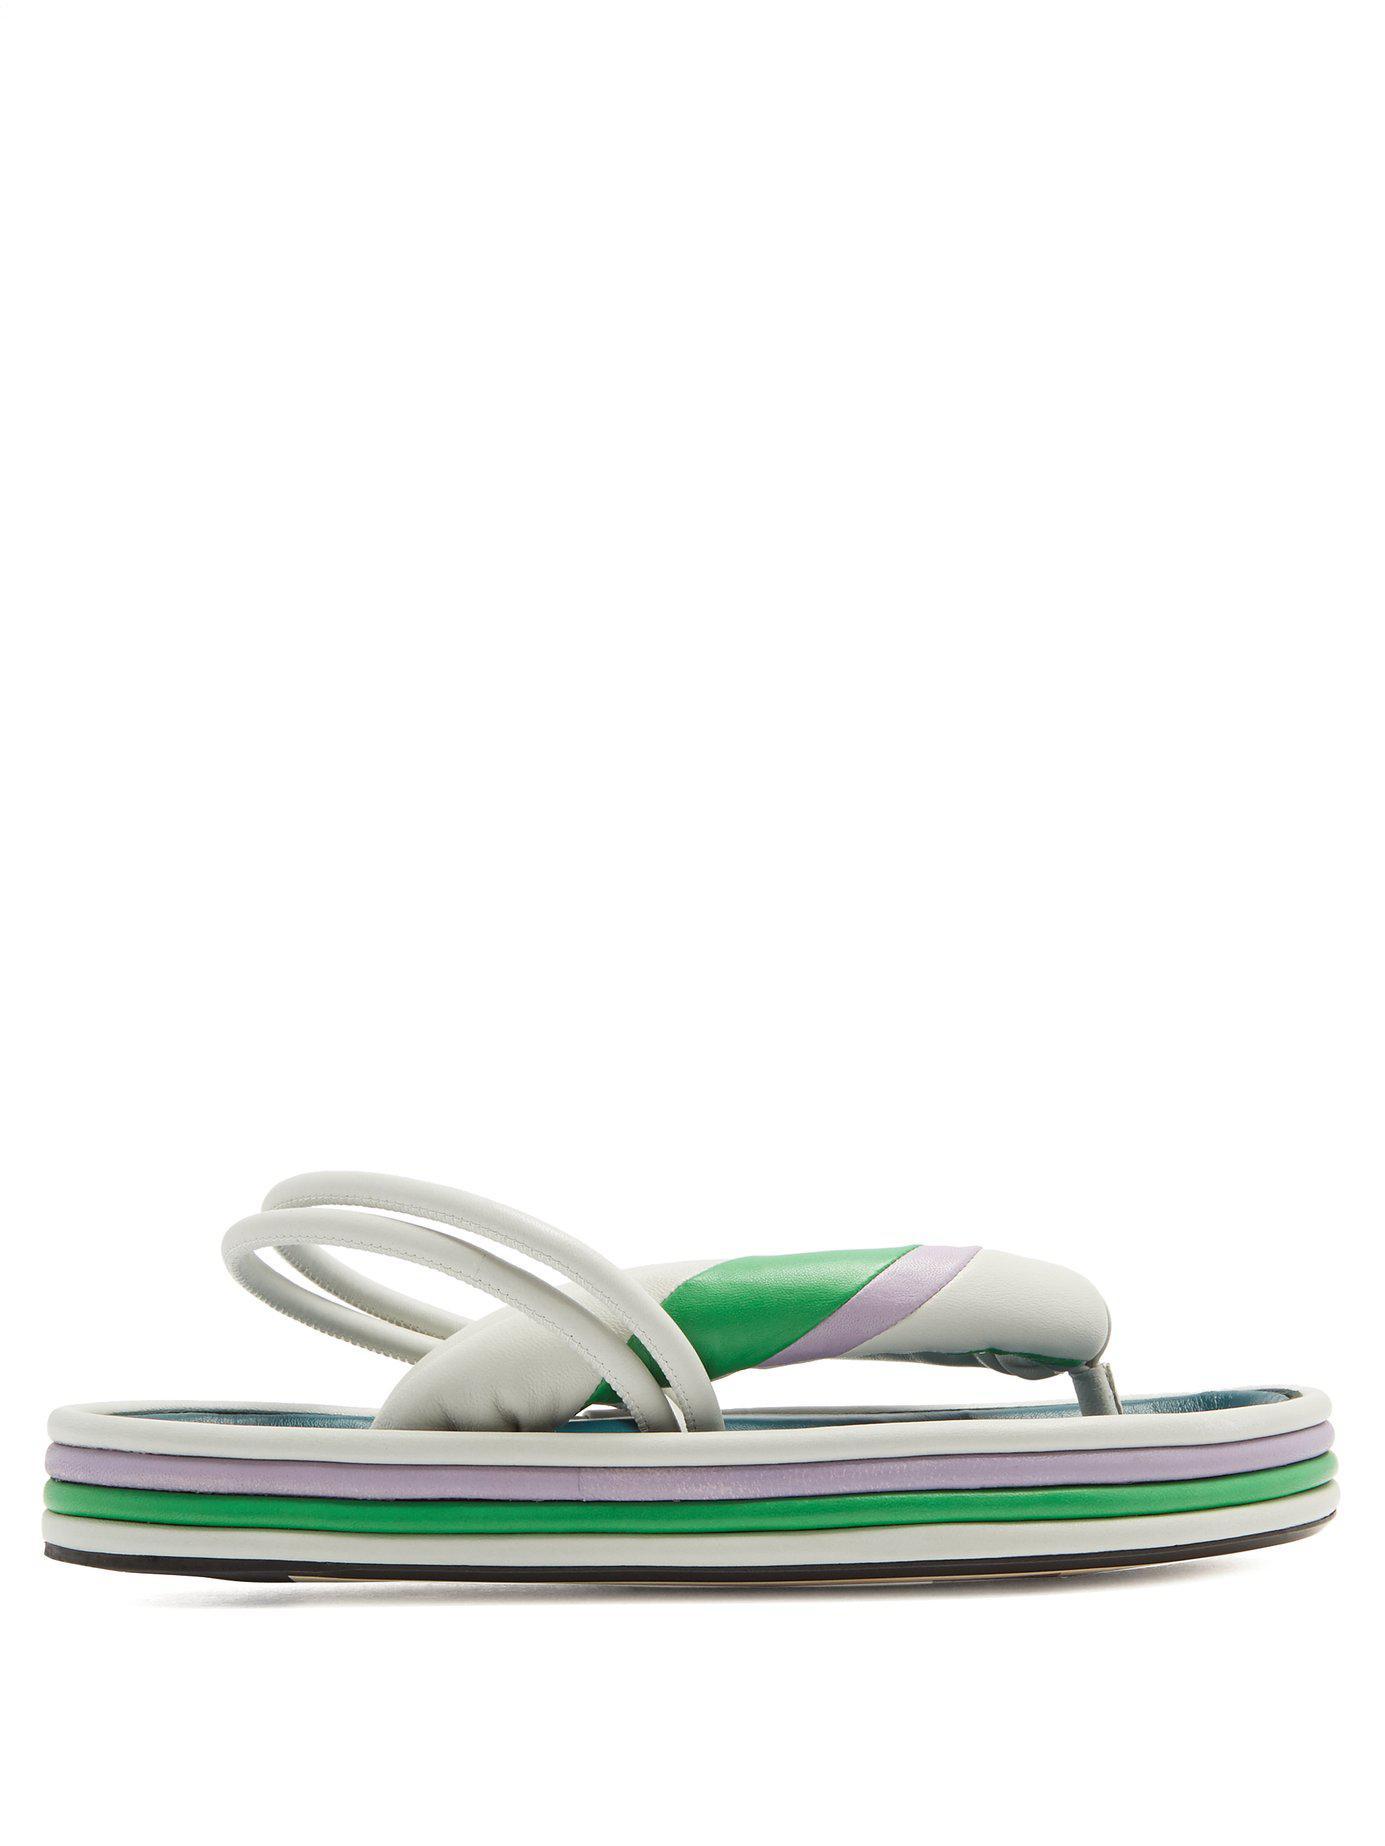 Sandales plateforme tricolores EtaneeIsabel Marant ea0GXSL